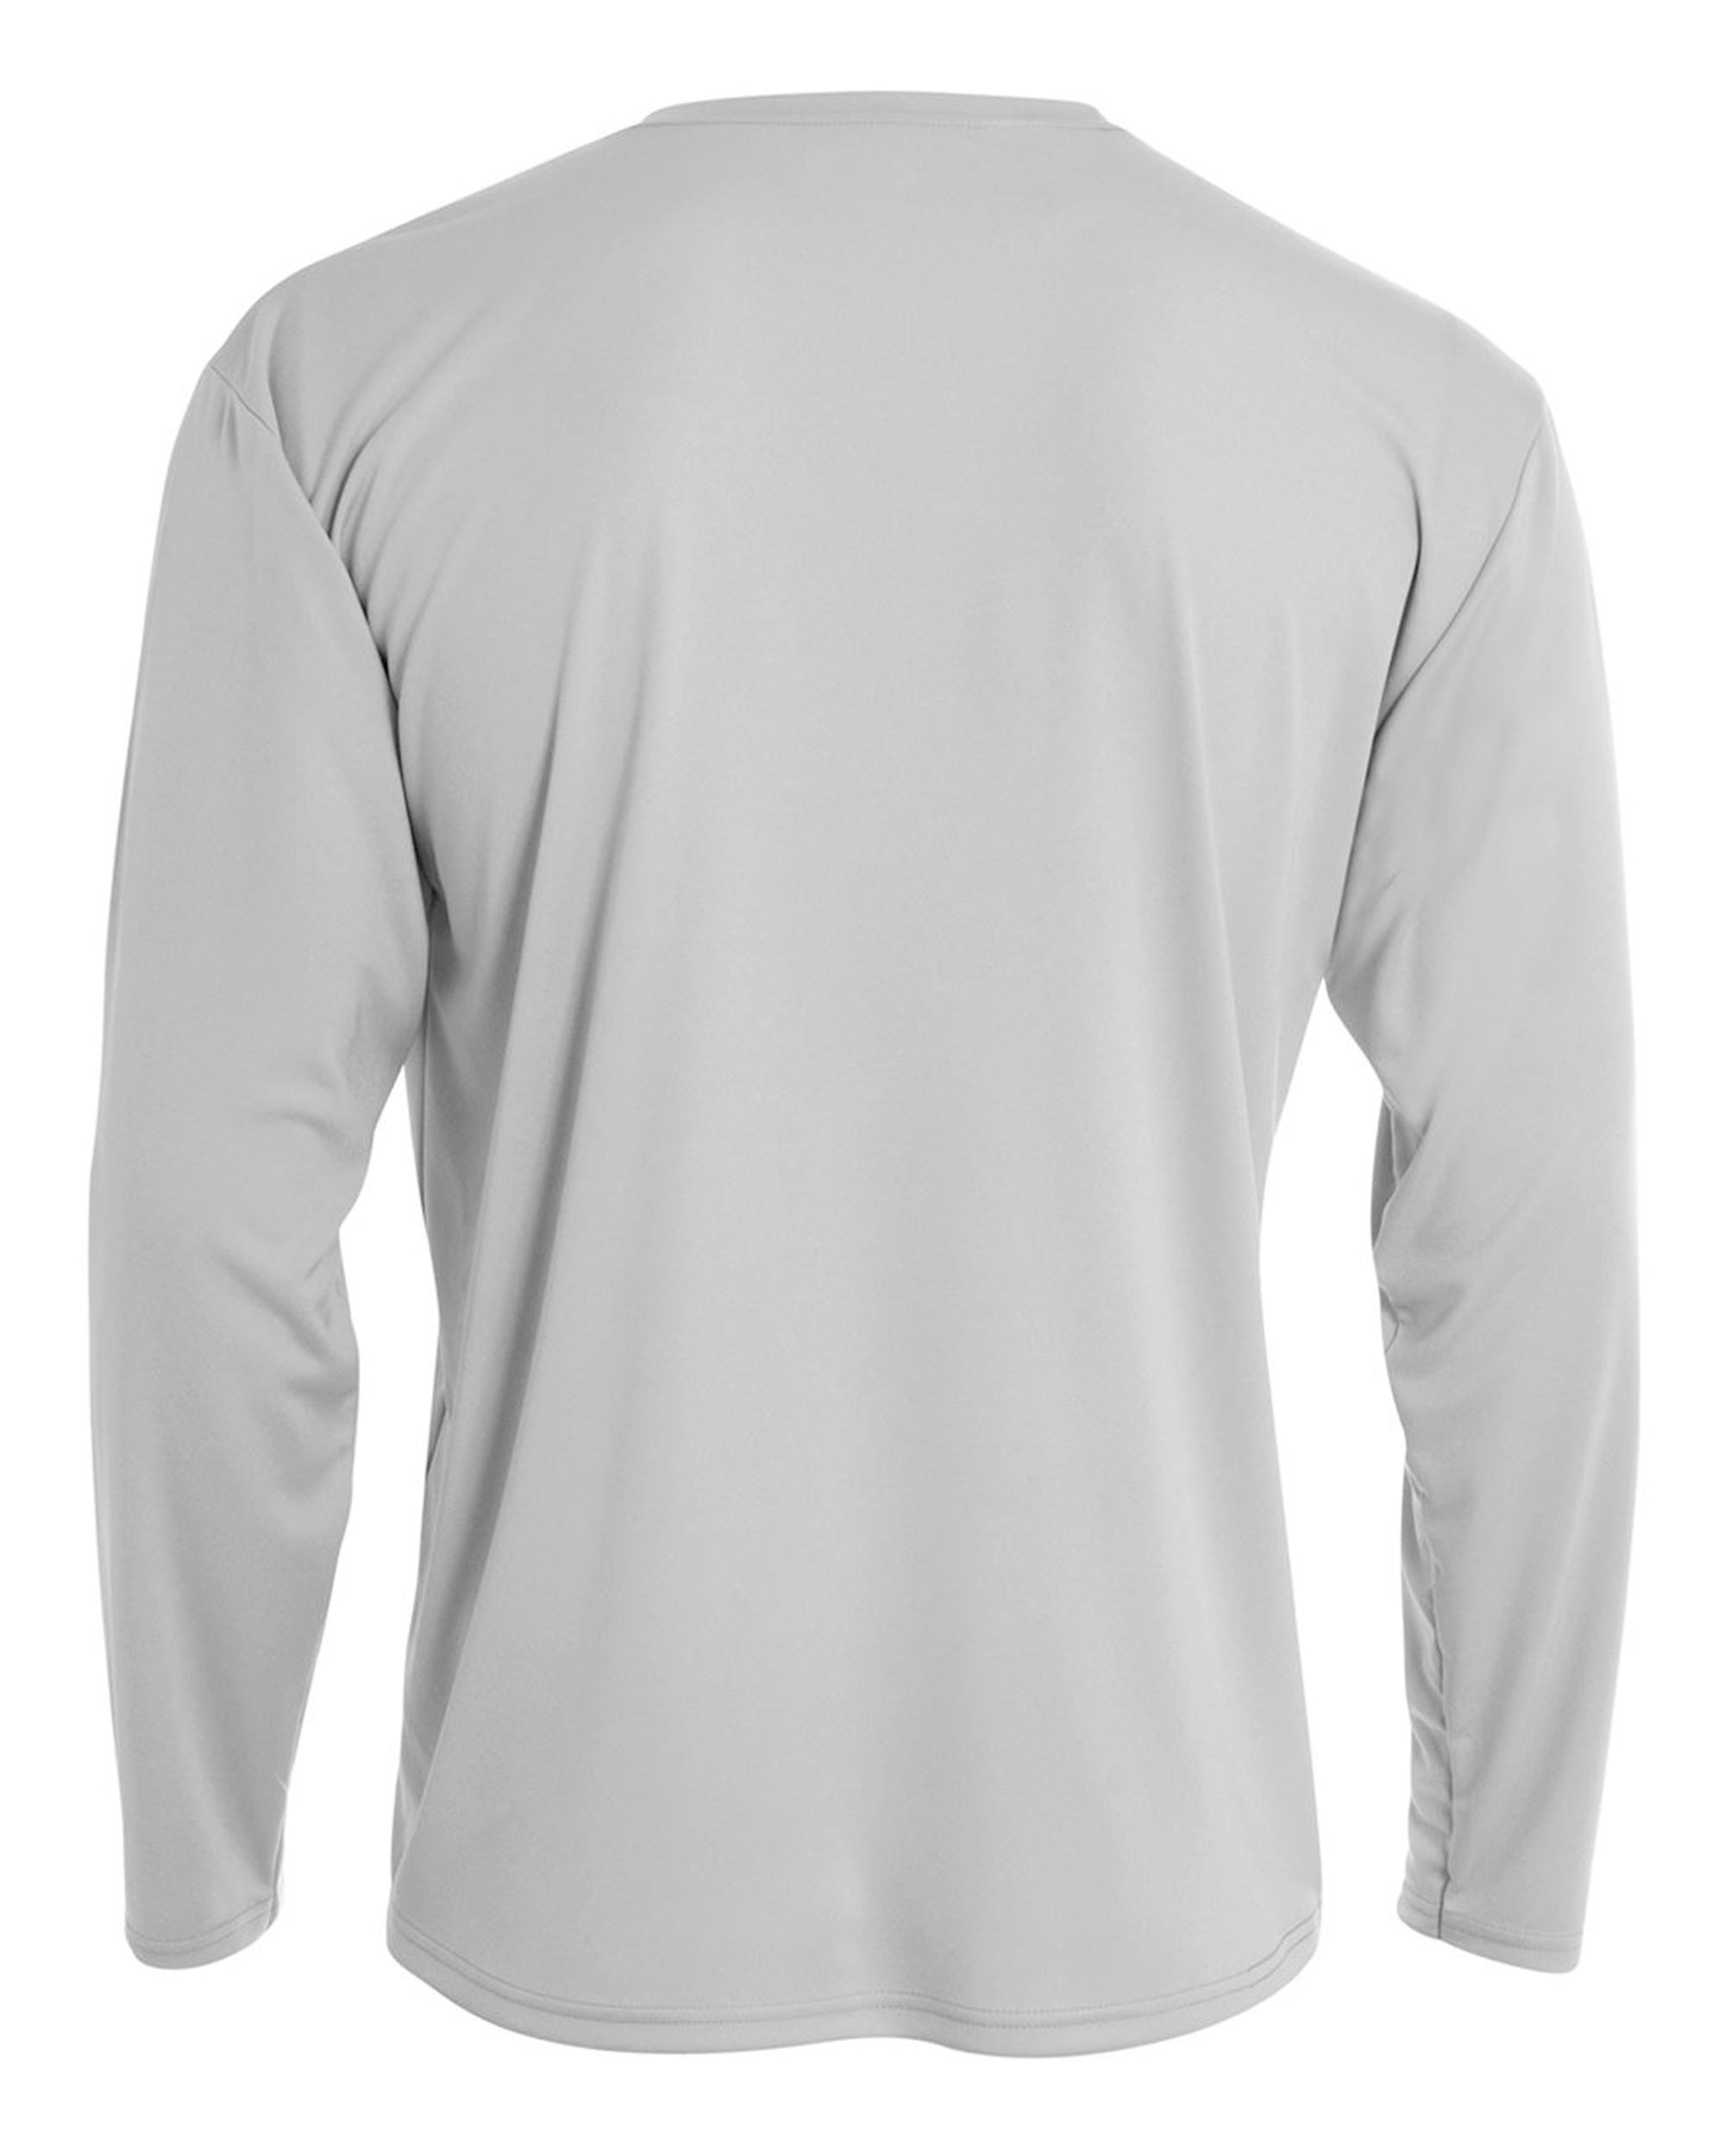 Men-039-s-Long-Sleeve-Loose-Fit-Rash-Guard-Surf-Shirt-Water-Sports-Swimwear thumbnail 24